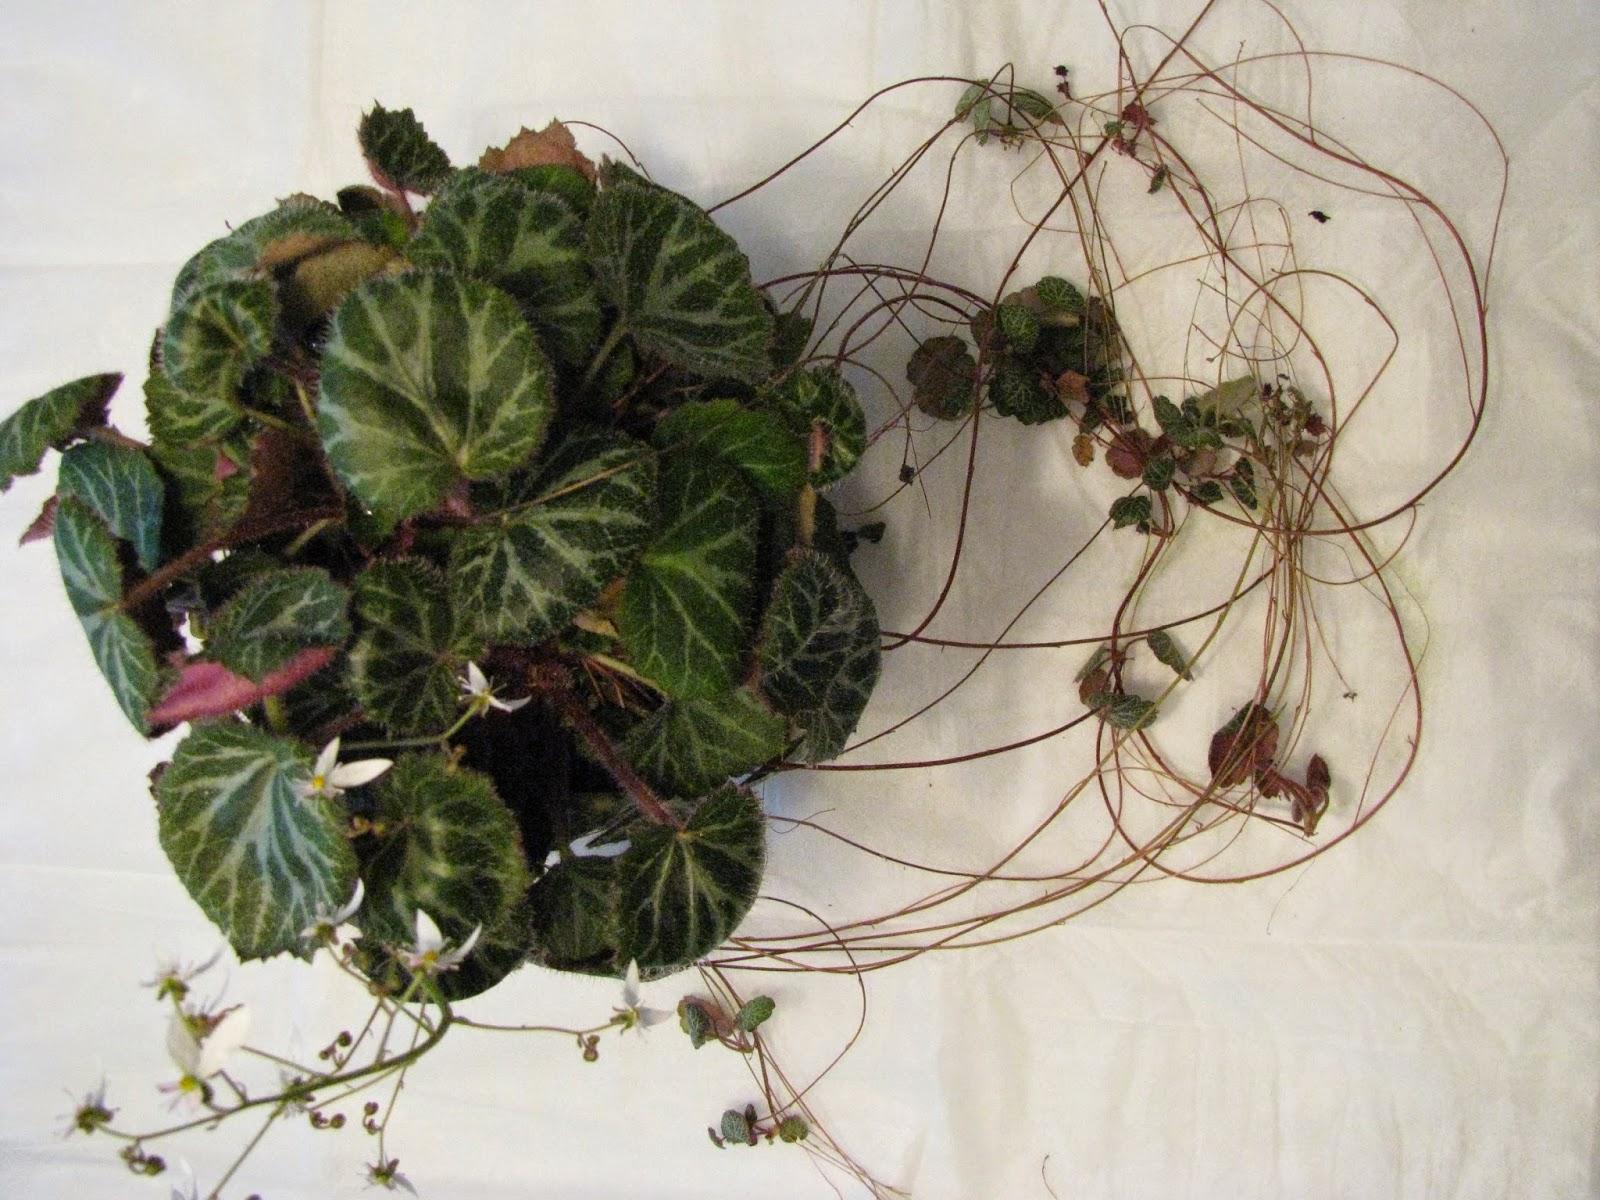 Strawberry Begonias Is Strawberry Geranium And Saxifragea Stolonifera